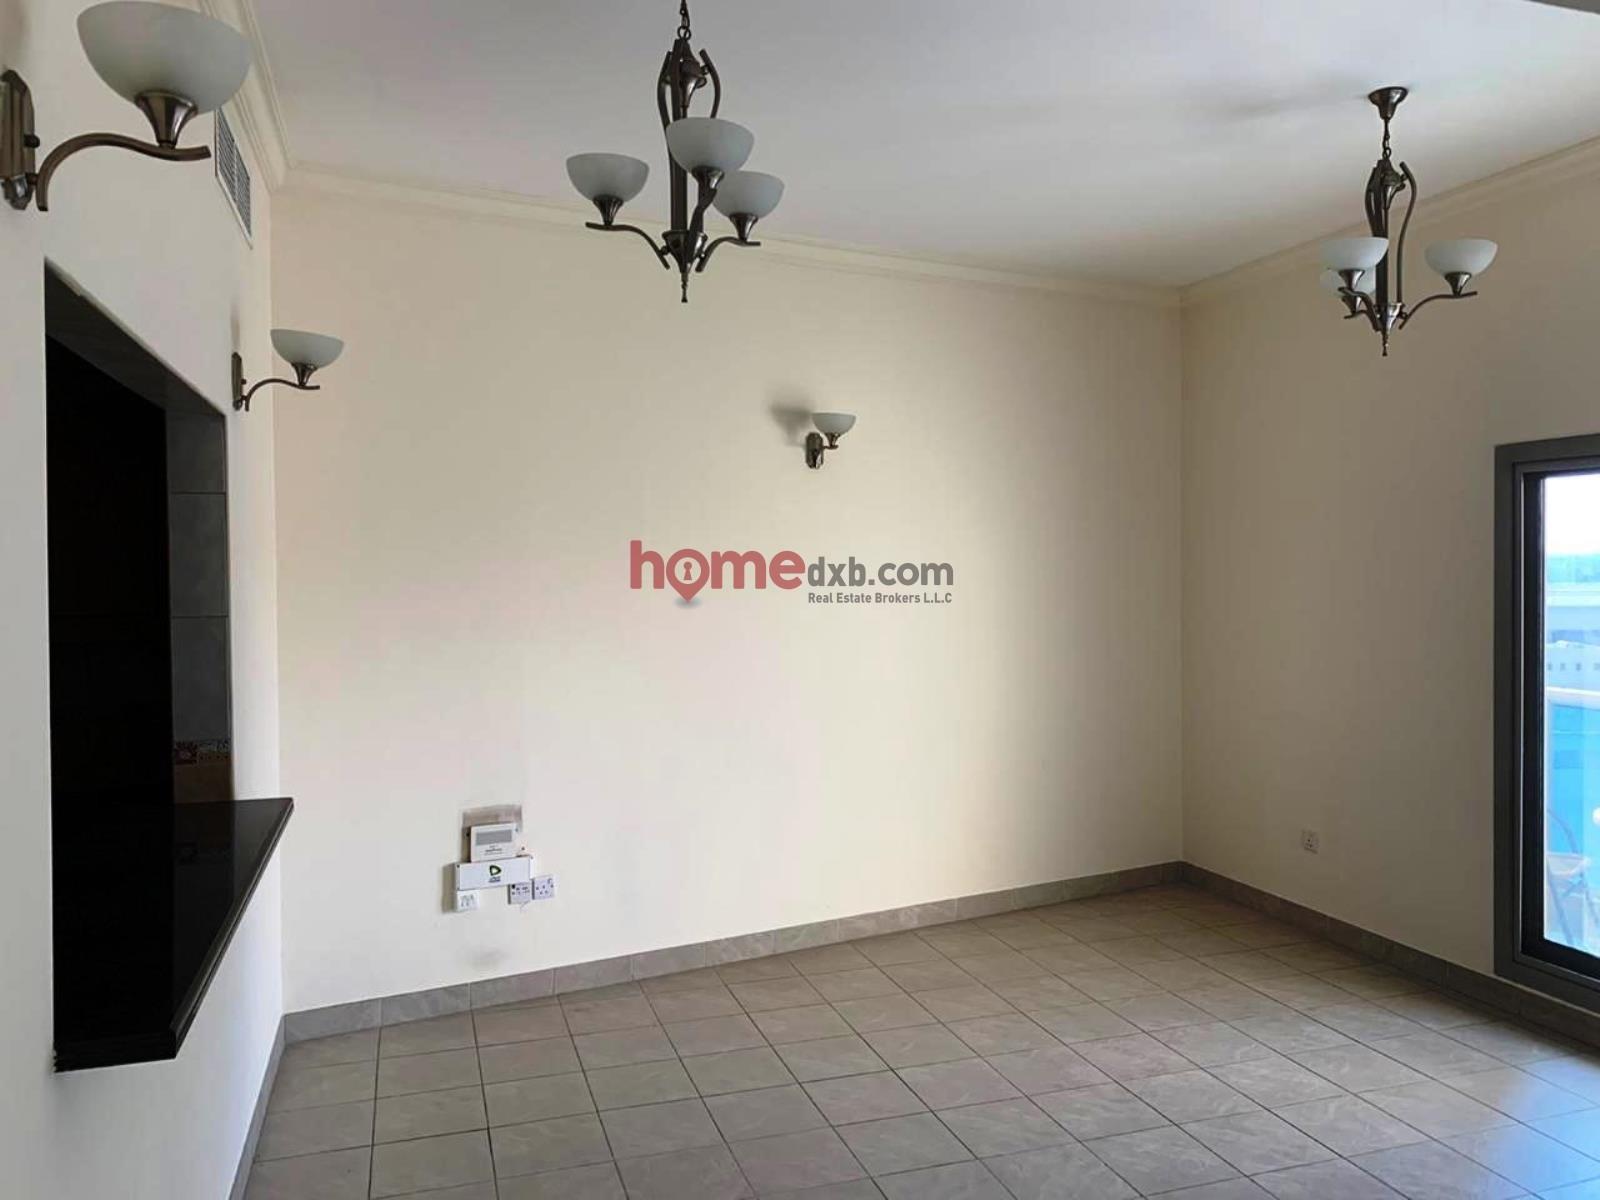 Unfurnished 1 BR Apartment, Belvedere, Marina